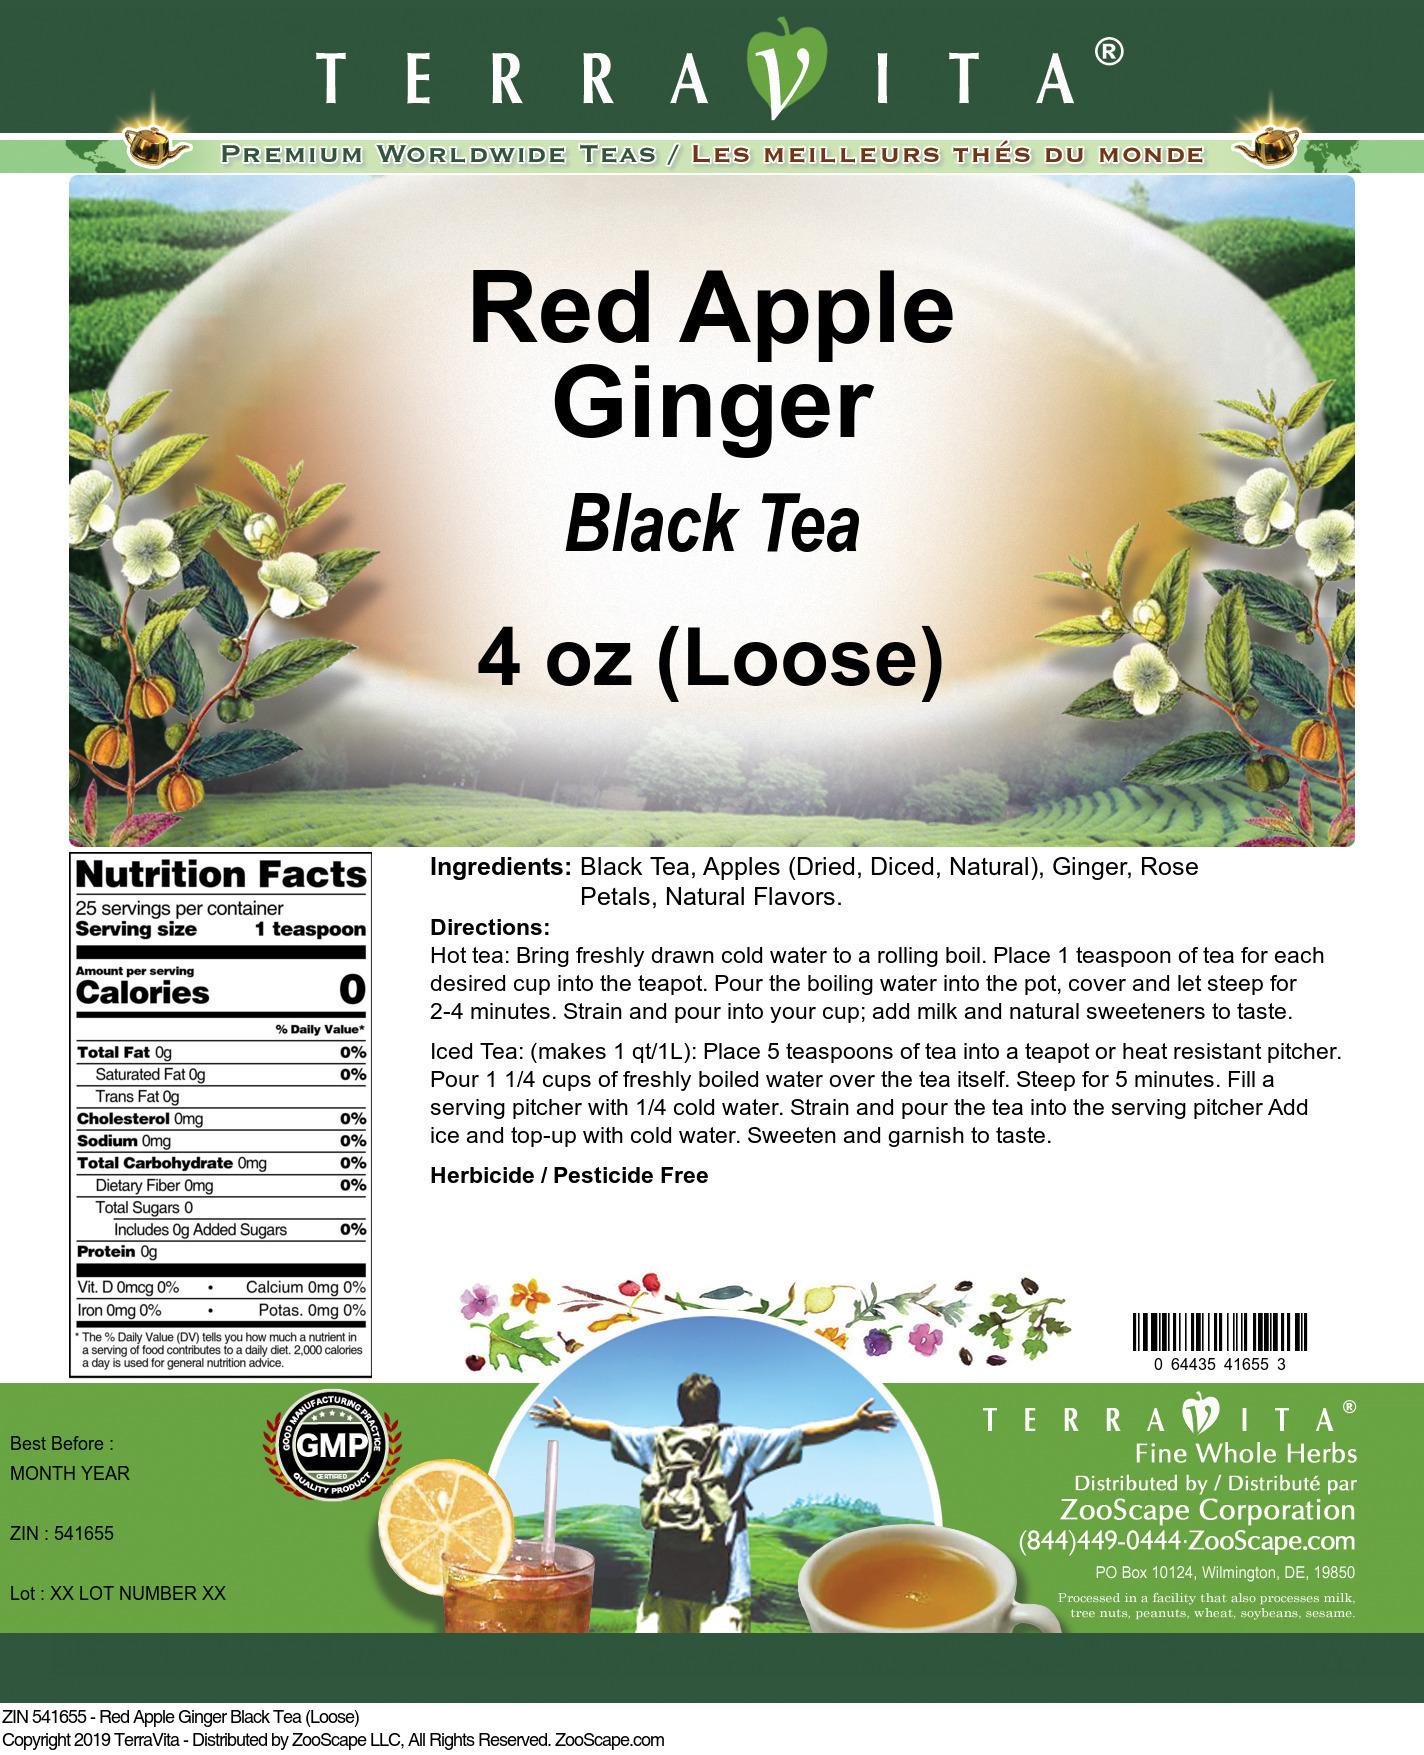 Red Apple Ginger Black Tea